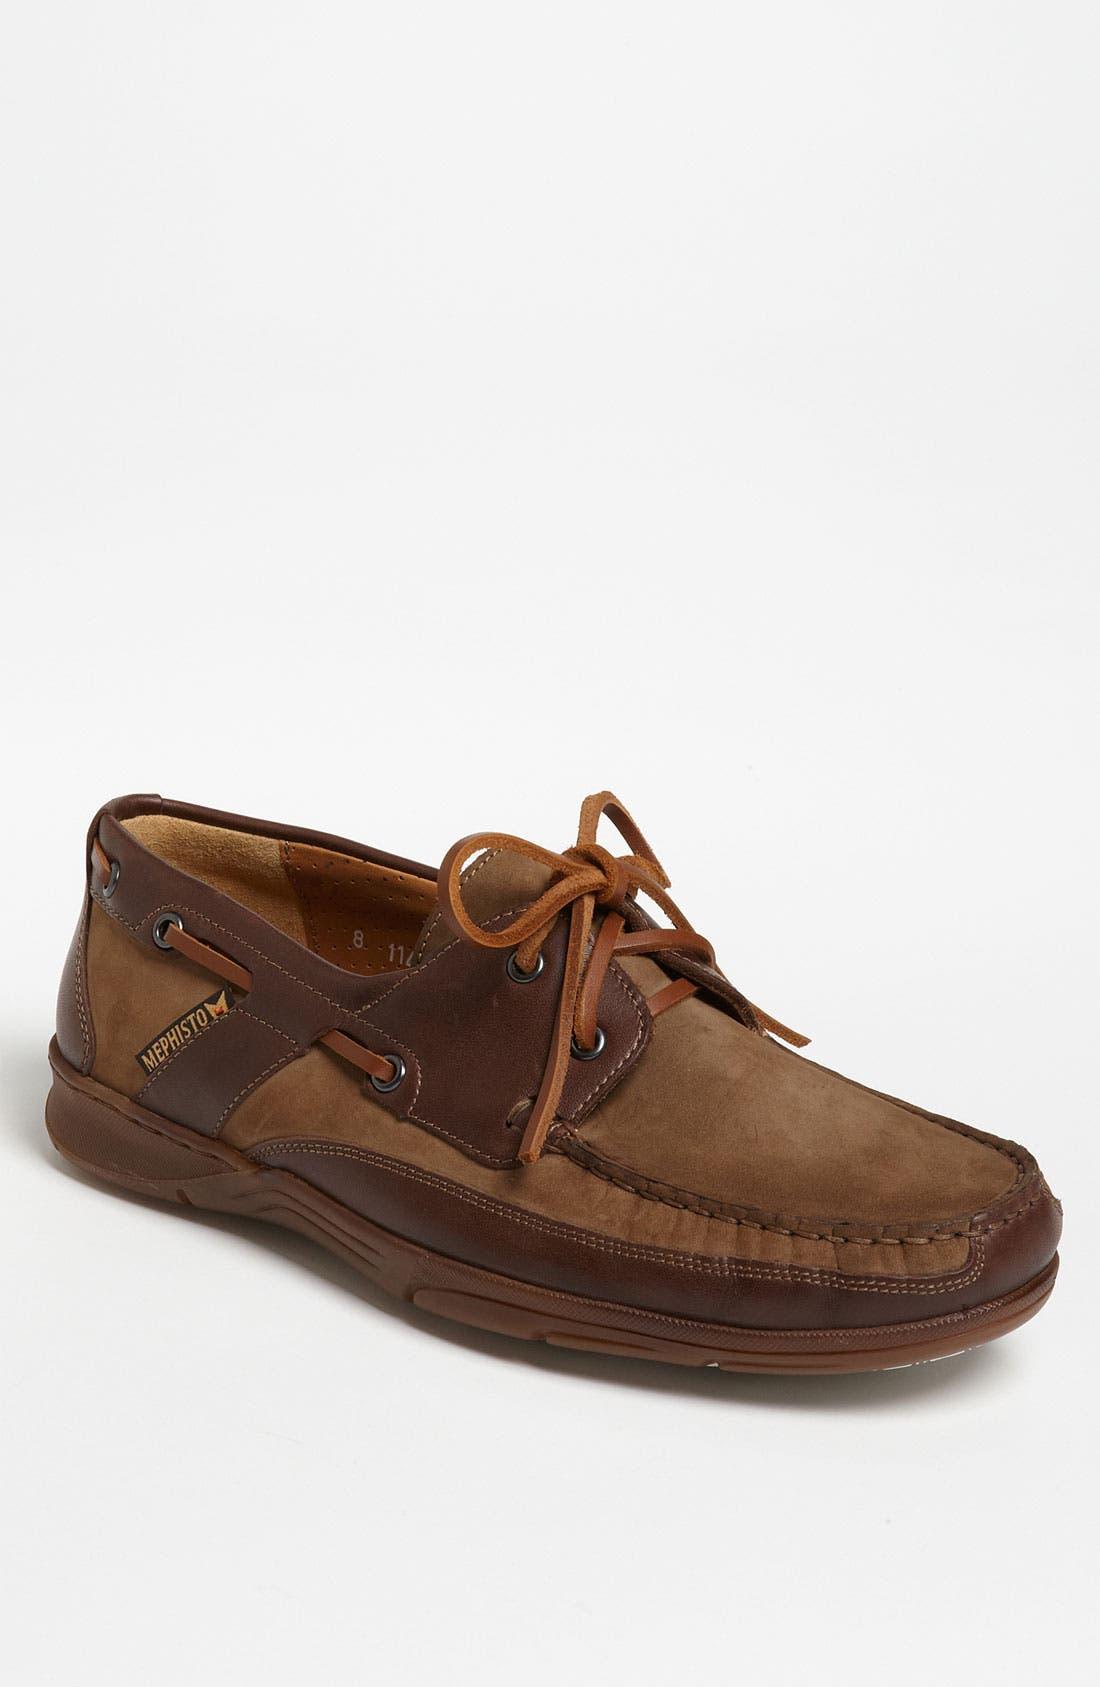 Main Image - Mephisto 'Felix' Boat Shoe (Men)